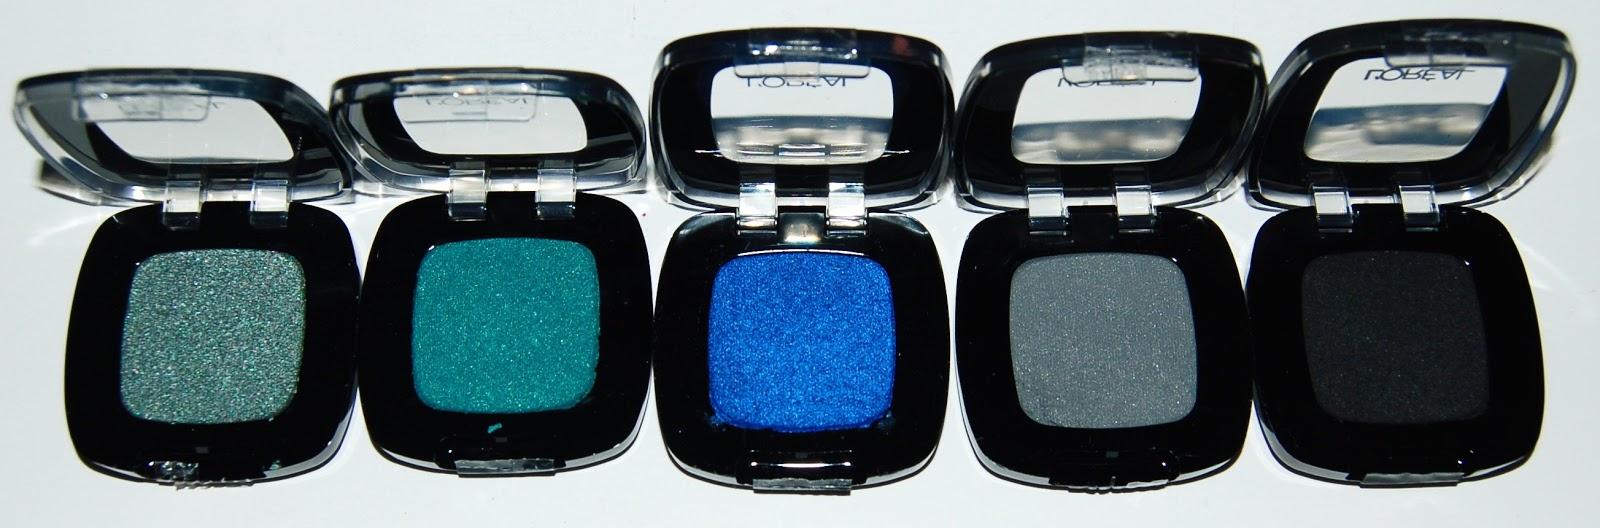 L'Oreal Colour Riche Eyeshadow Monos